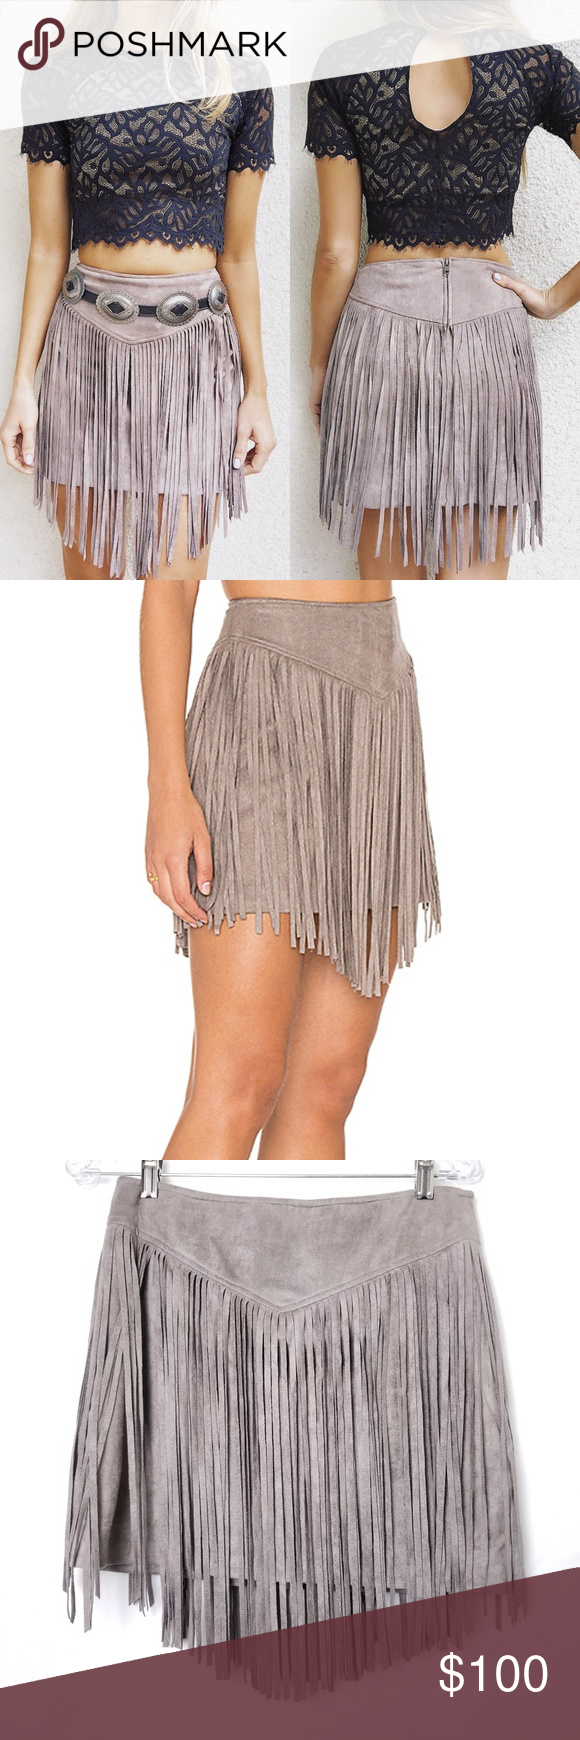 9001191957 Show Me Your Mumu Rancho Fringe Taupe Skirt Show Me Your Mumu Rancho Fringe  Taupe Faux